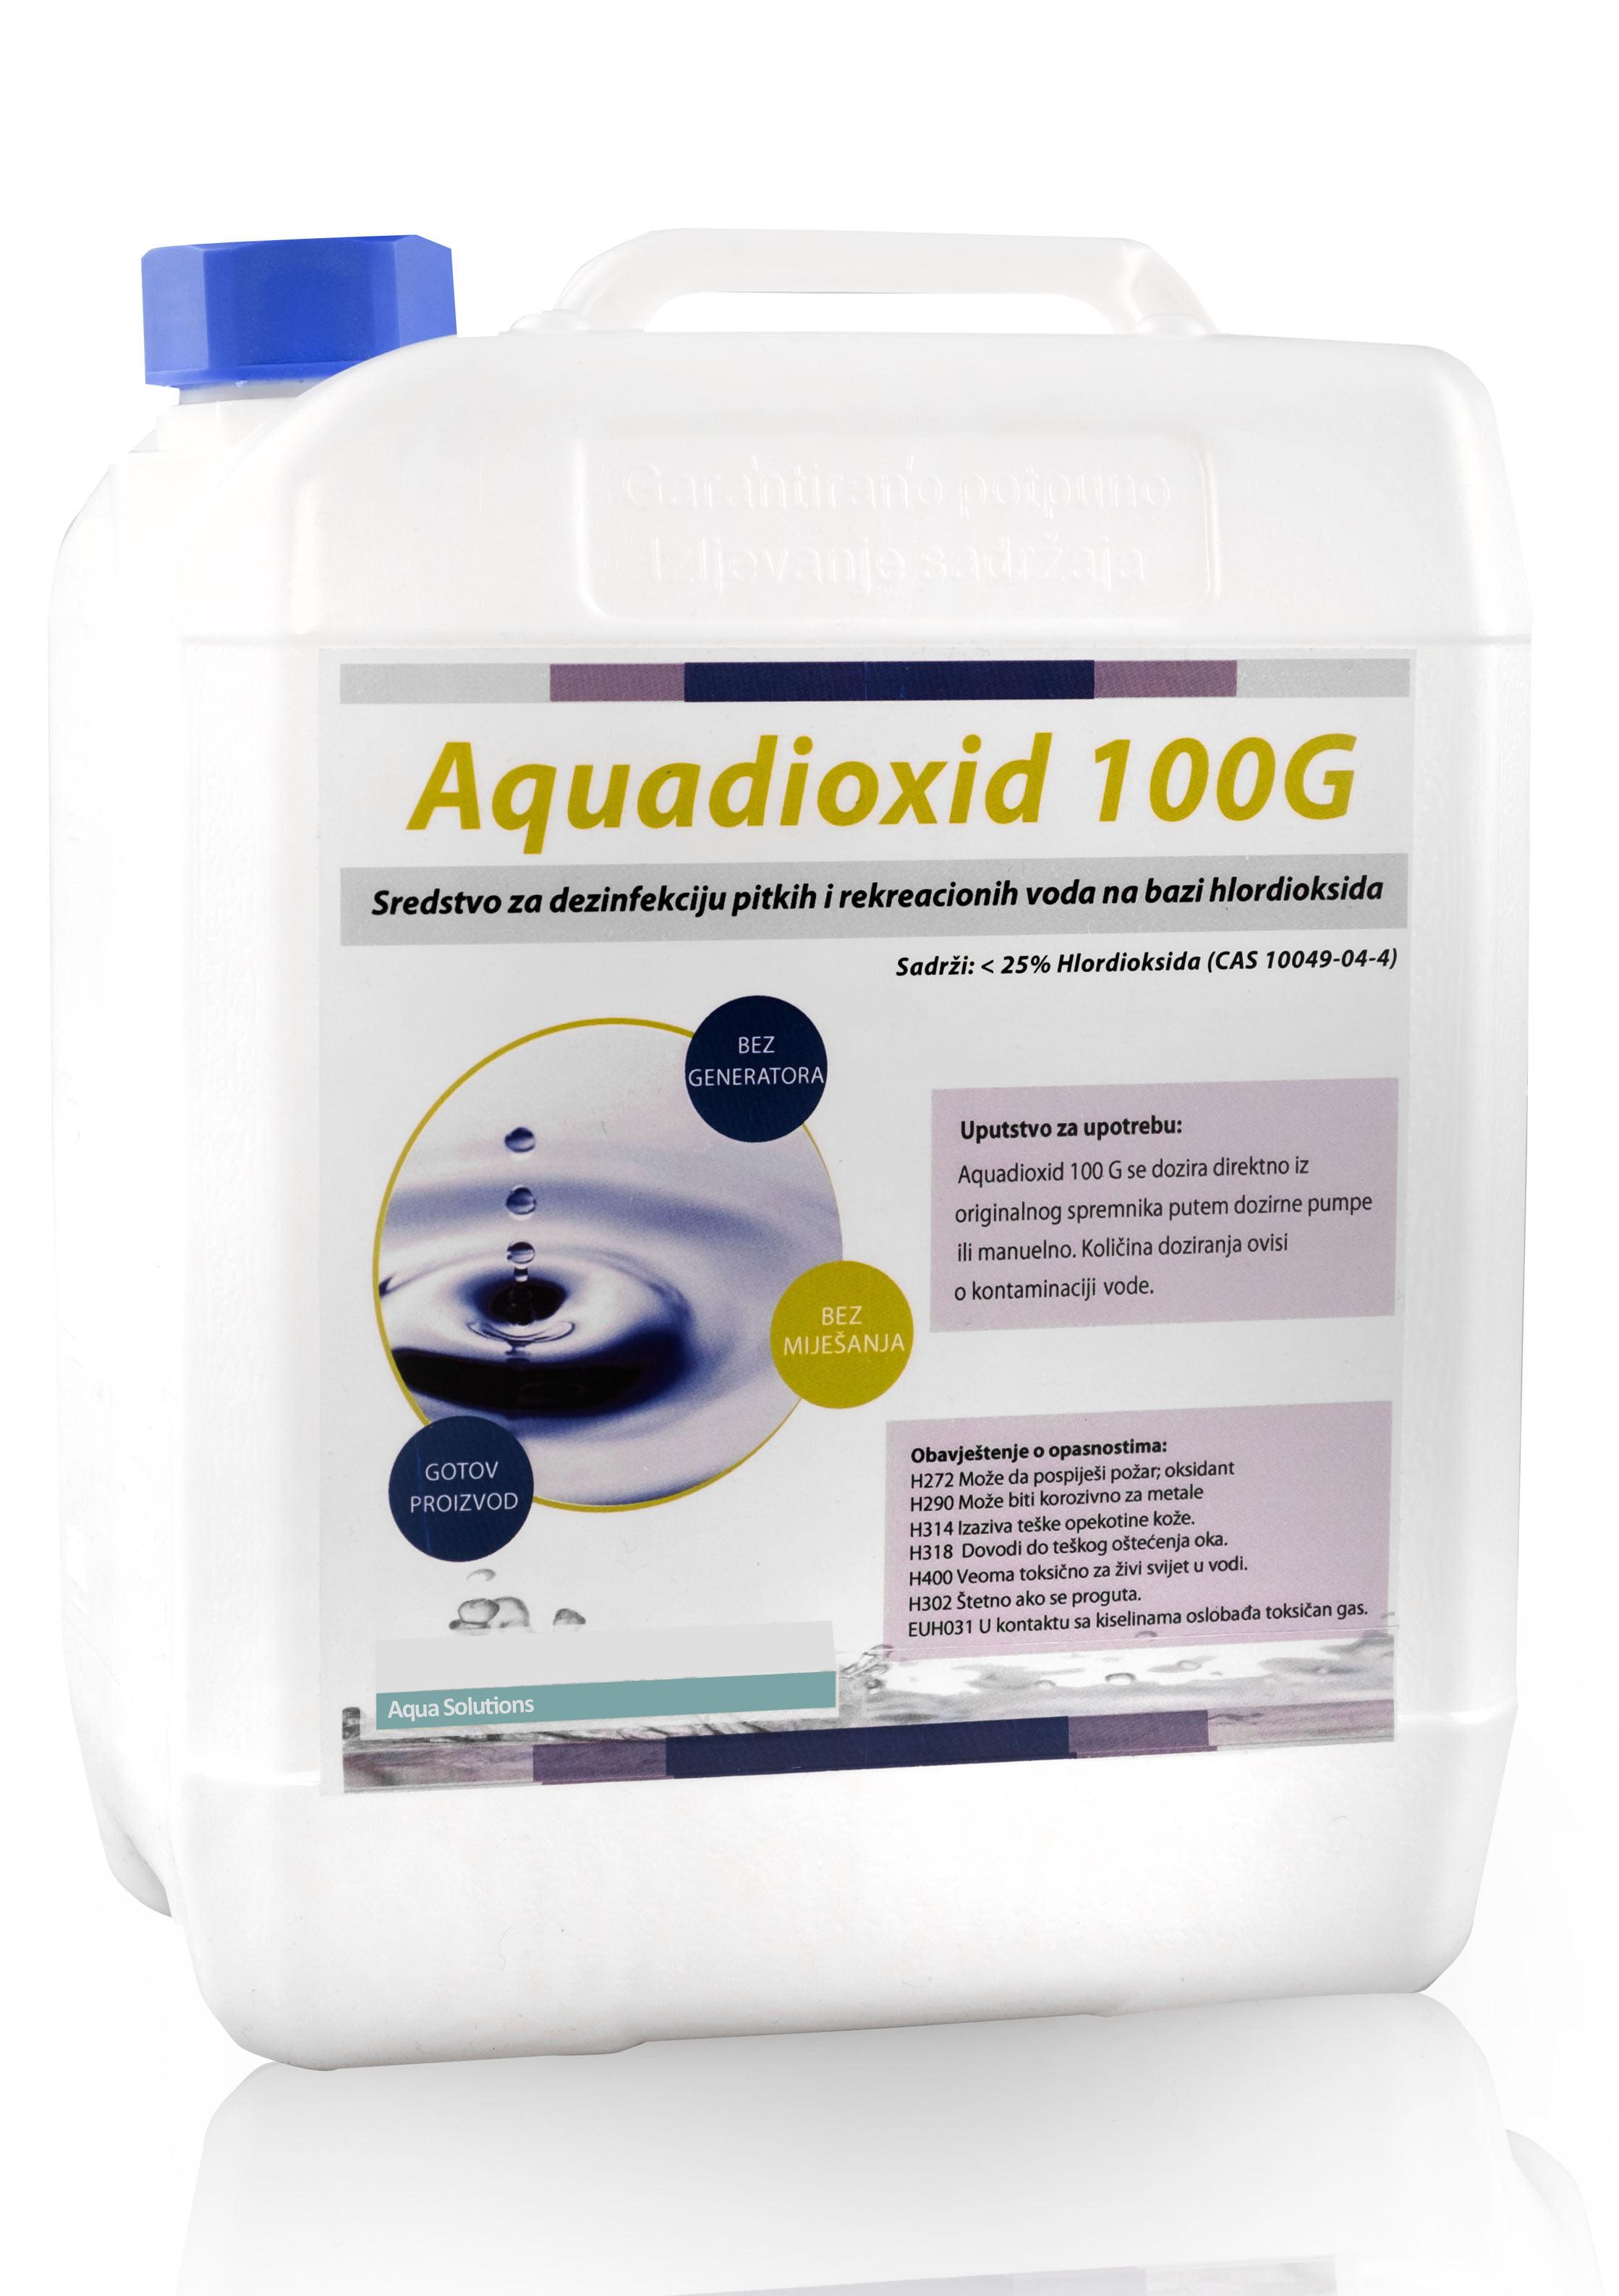 Aquadioxid-sa-sjenkom-home-done-new